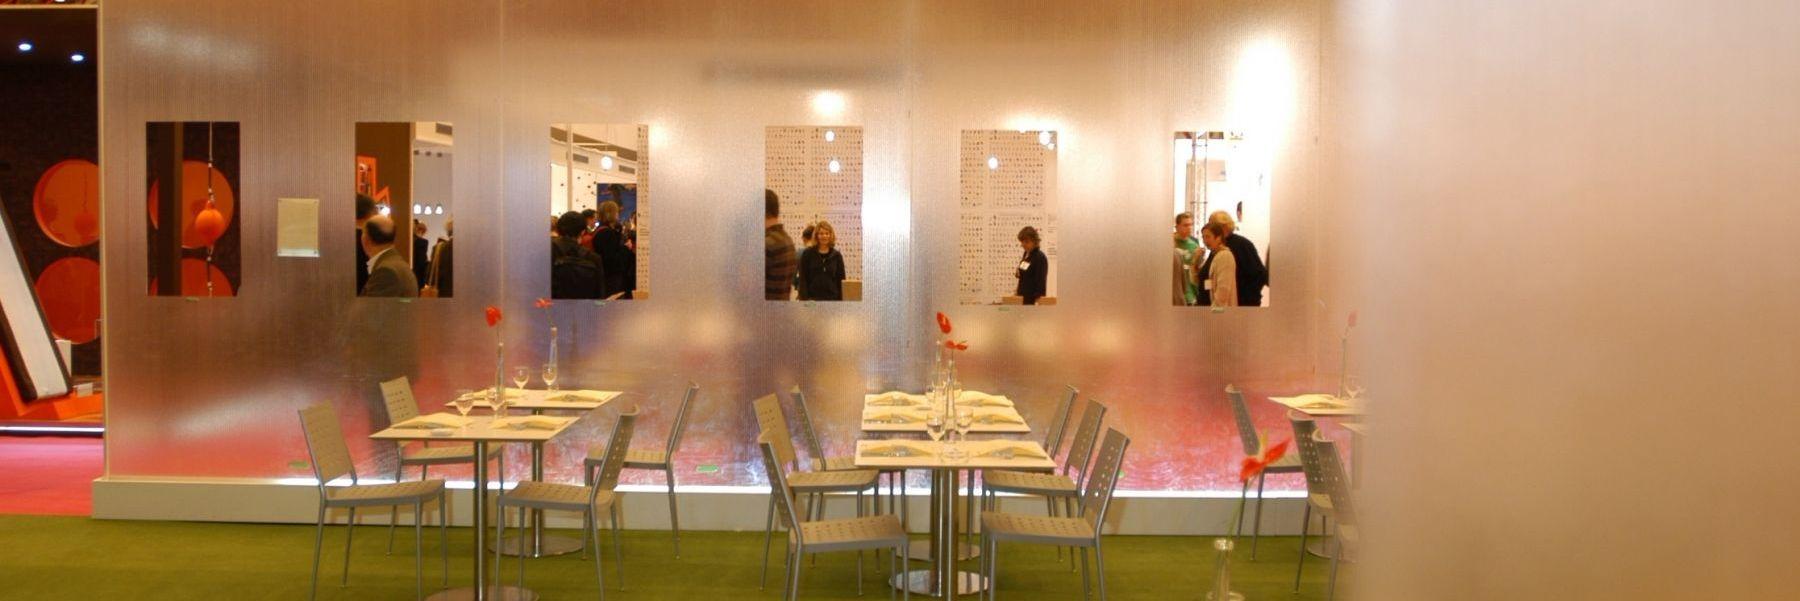 LEXAN THERMOCLEAR multiwall sheet interior glazing aesthetics transparent transparency aethetics